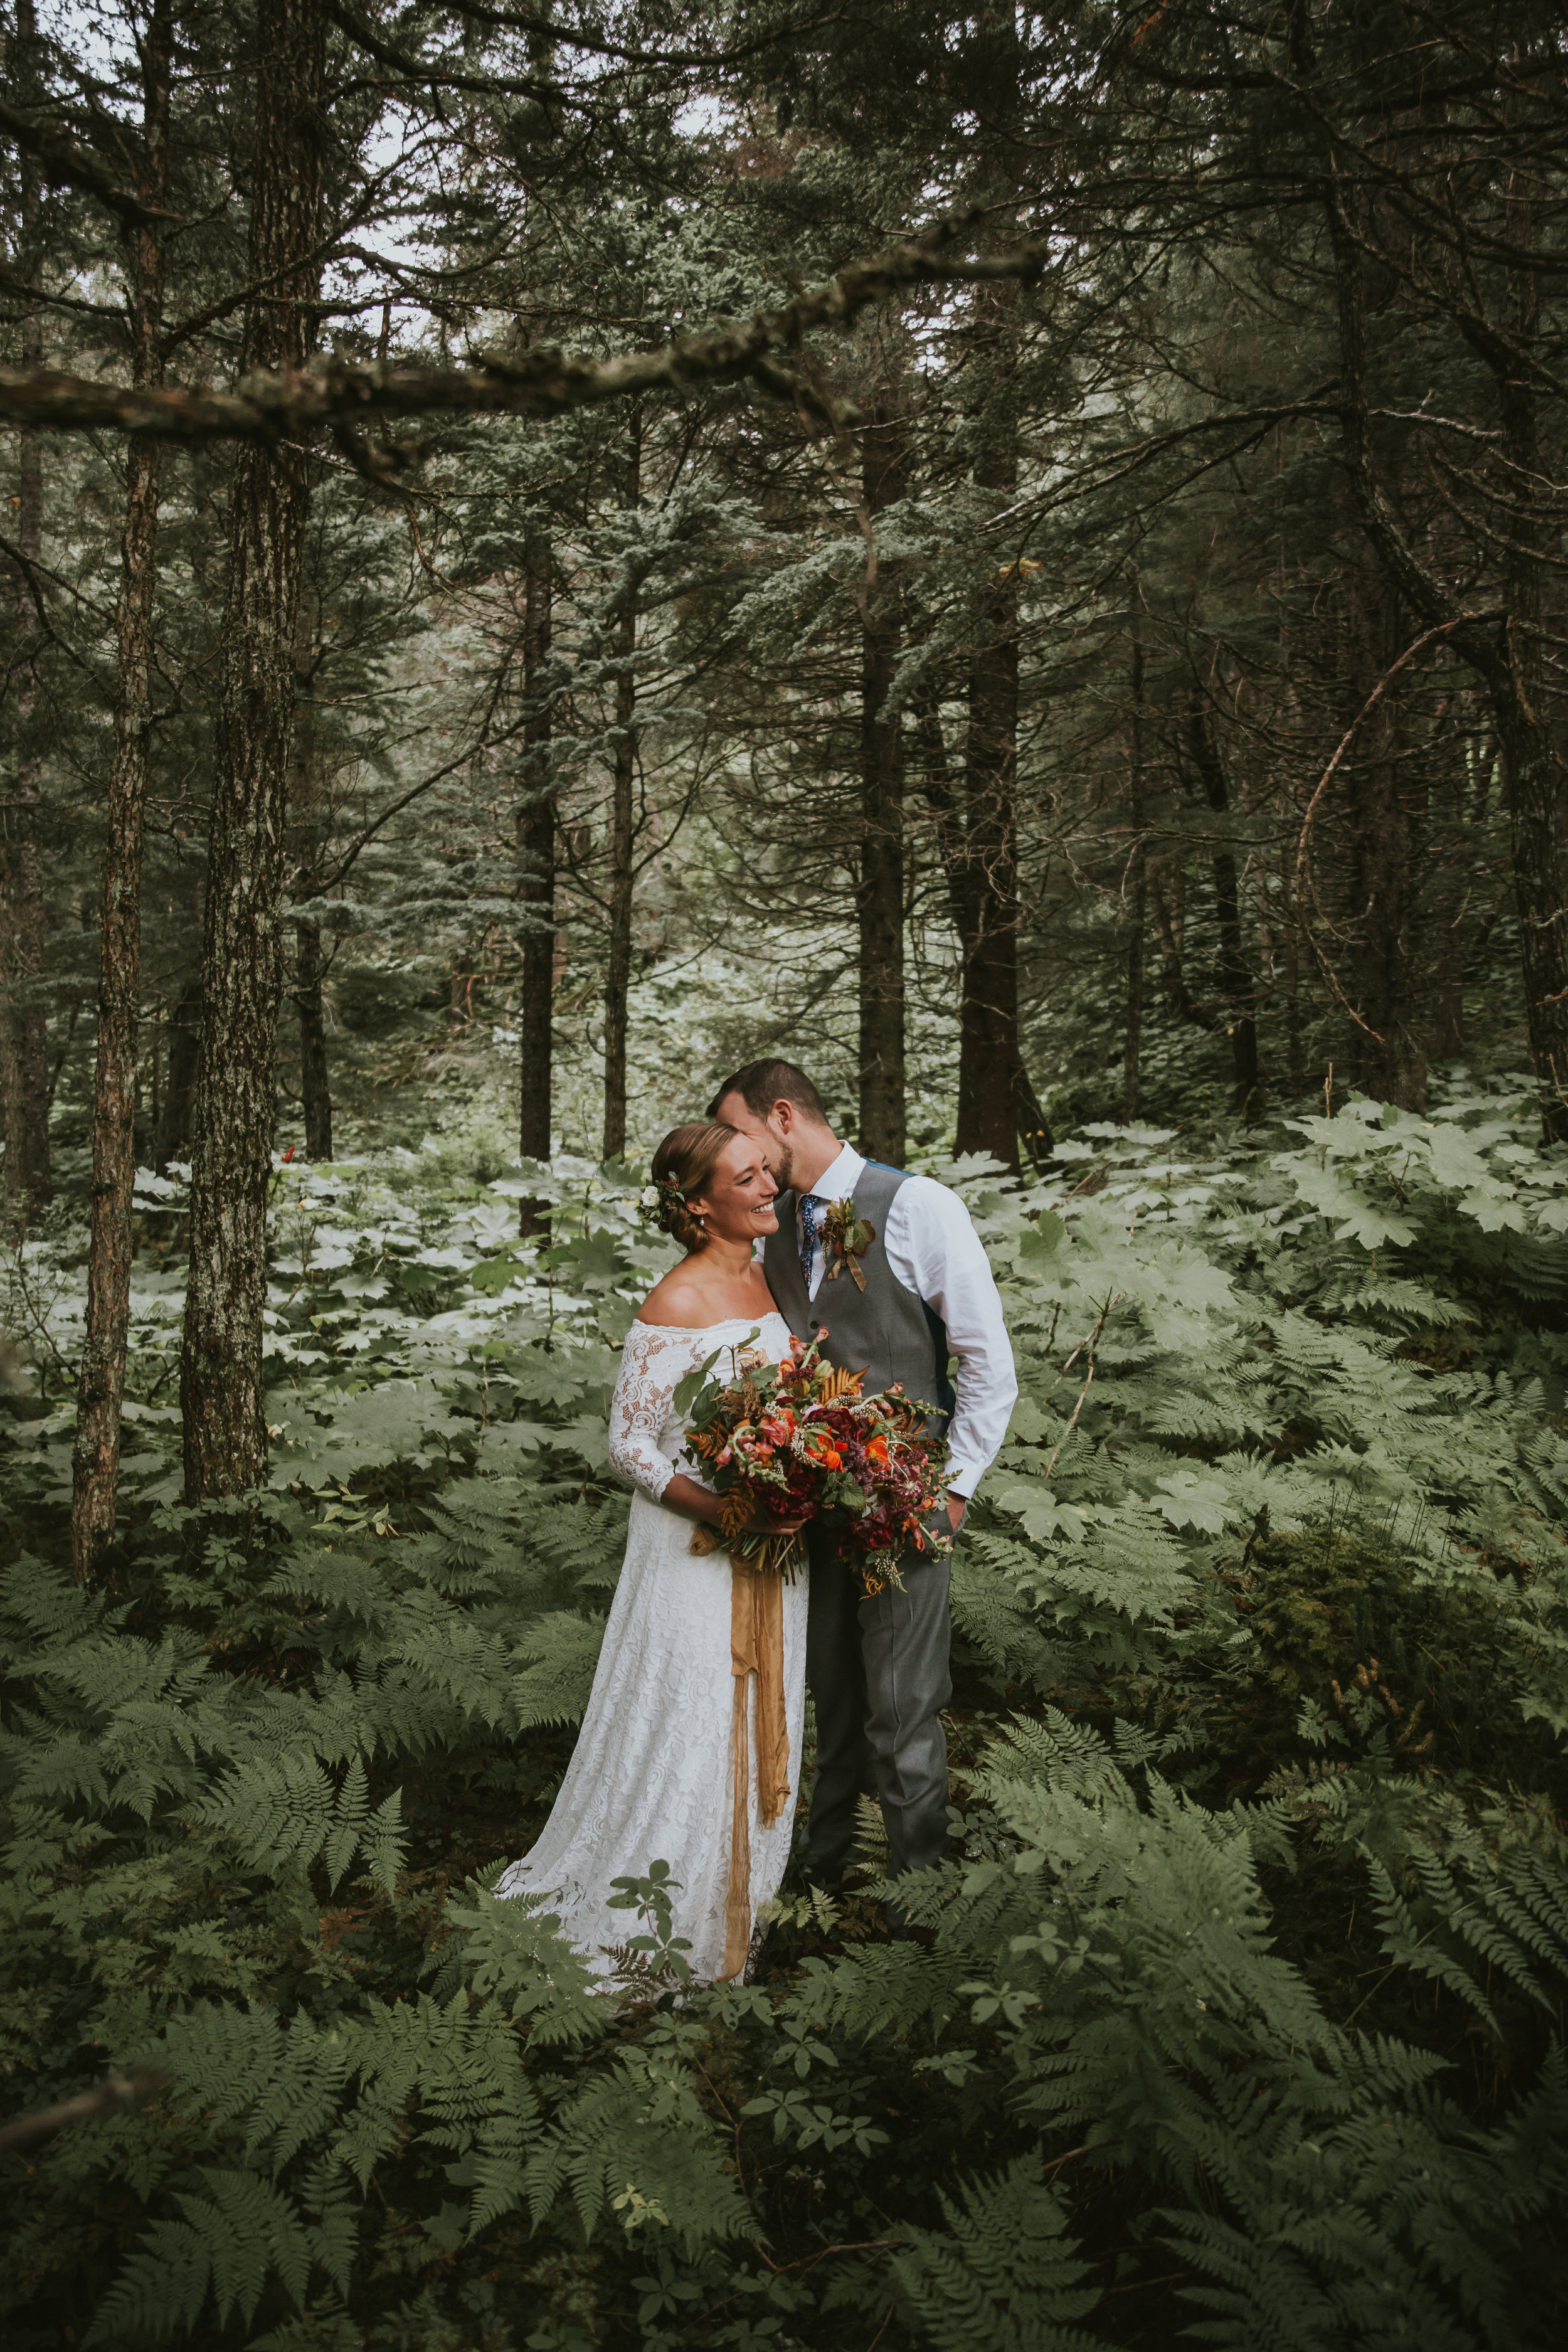 KELLI AND RYAN WEDDING - GIRDWOOD, ALASKA